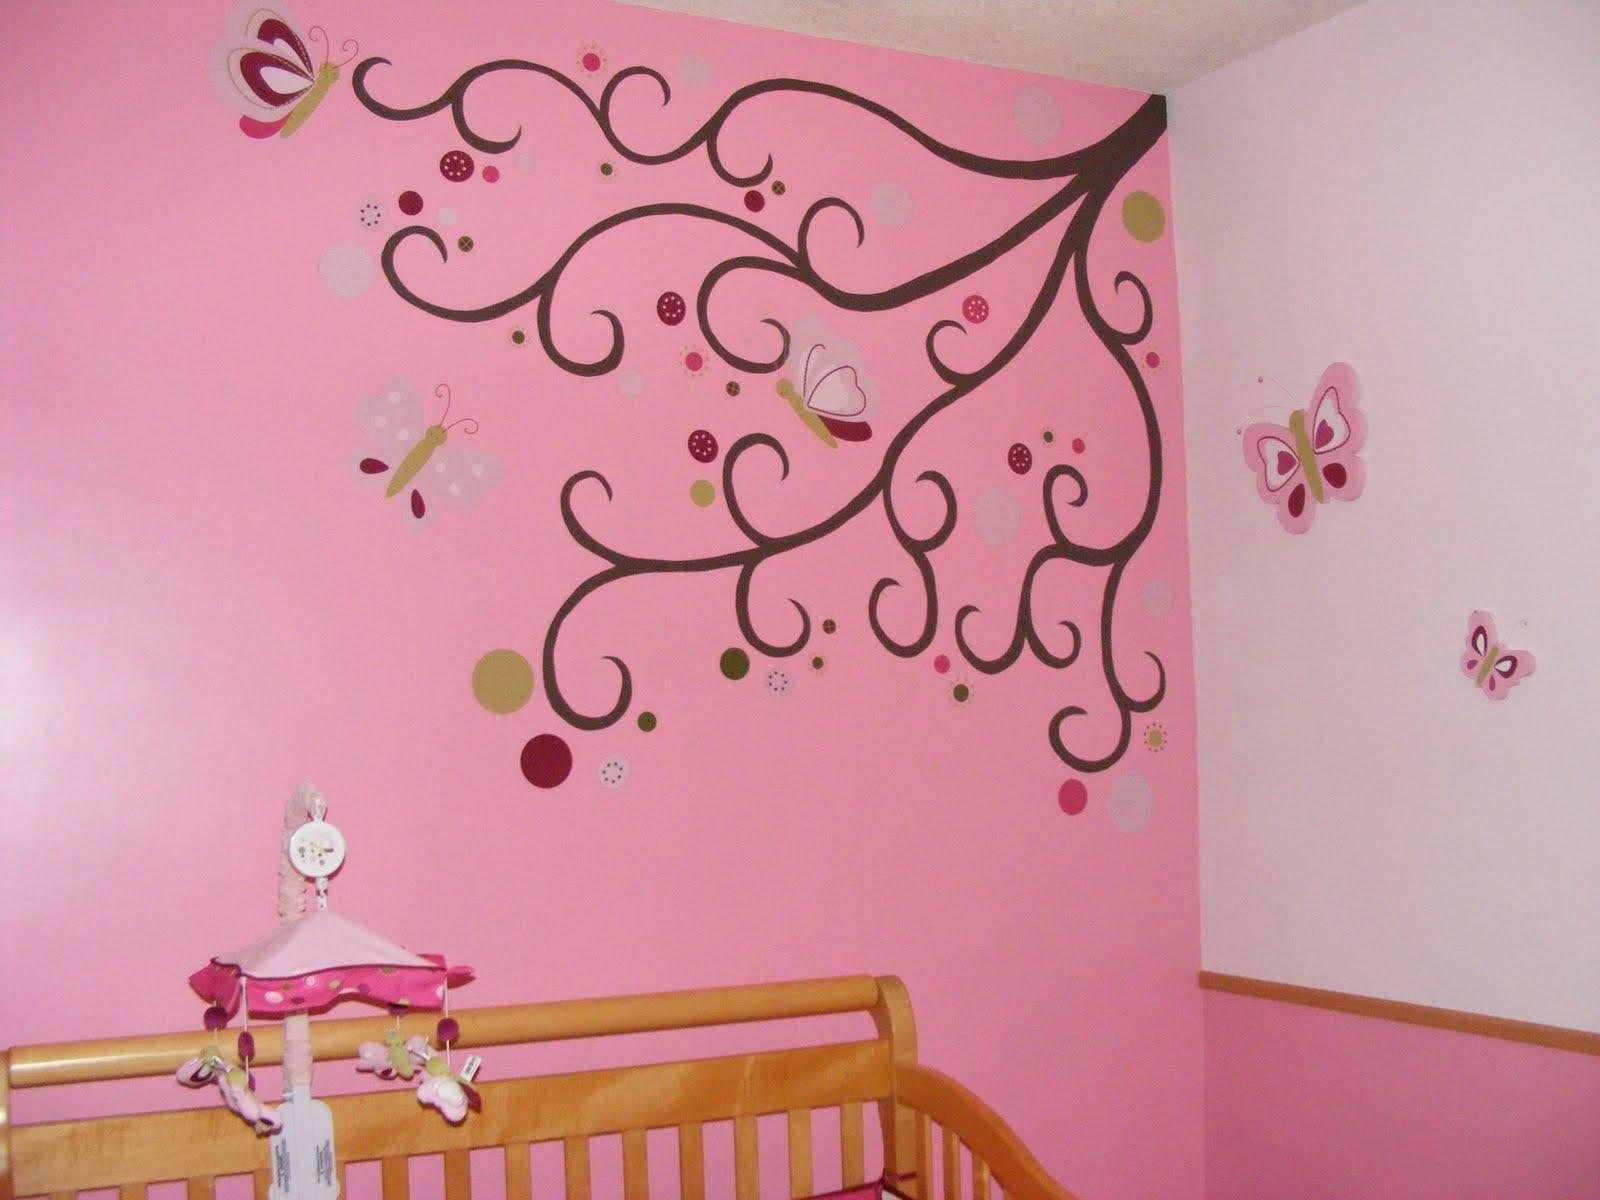 Murales infantiles 03 25 10 for Murales para decoracion